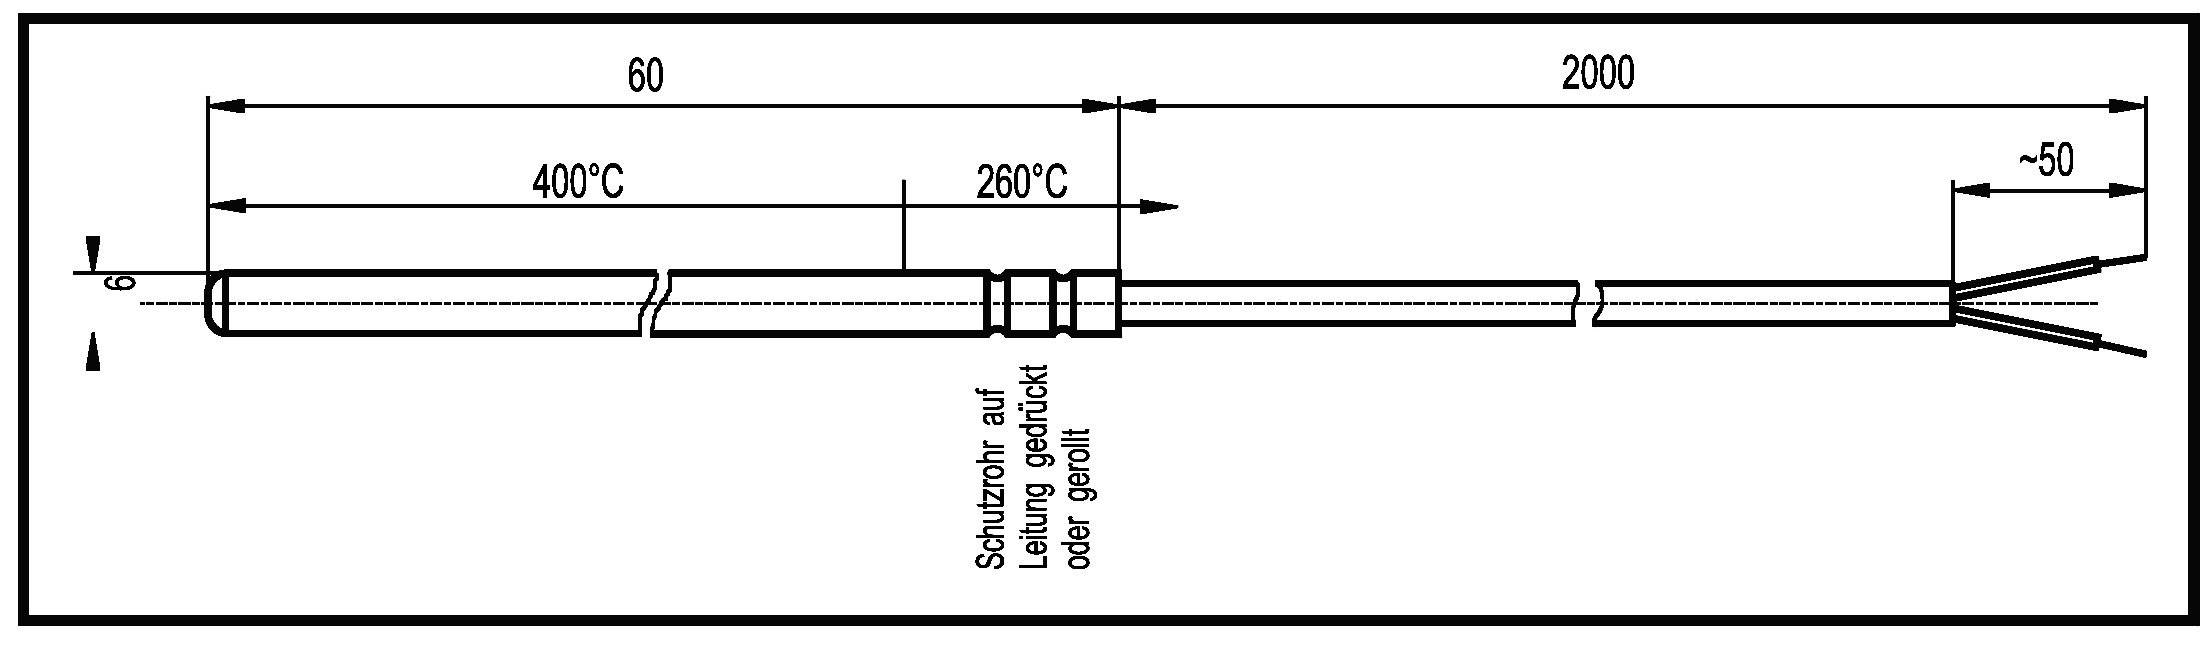 Termočlánek Enda K1-TC-J-600, -50 až 600 °C